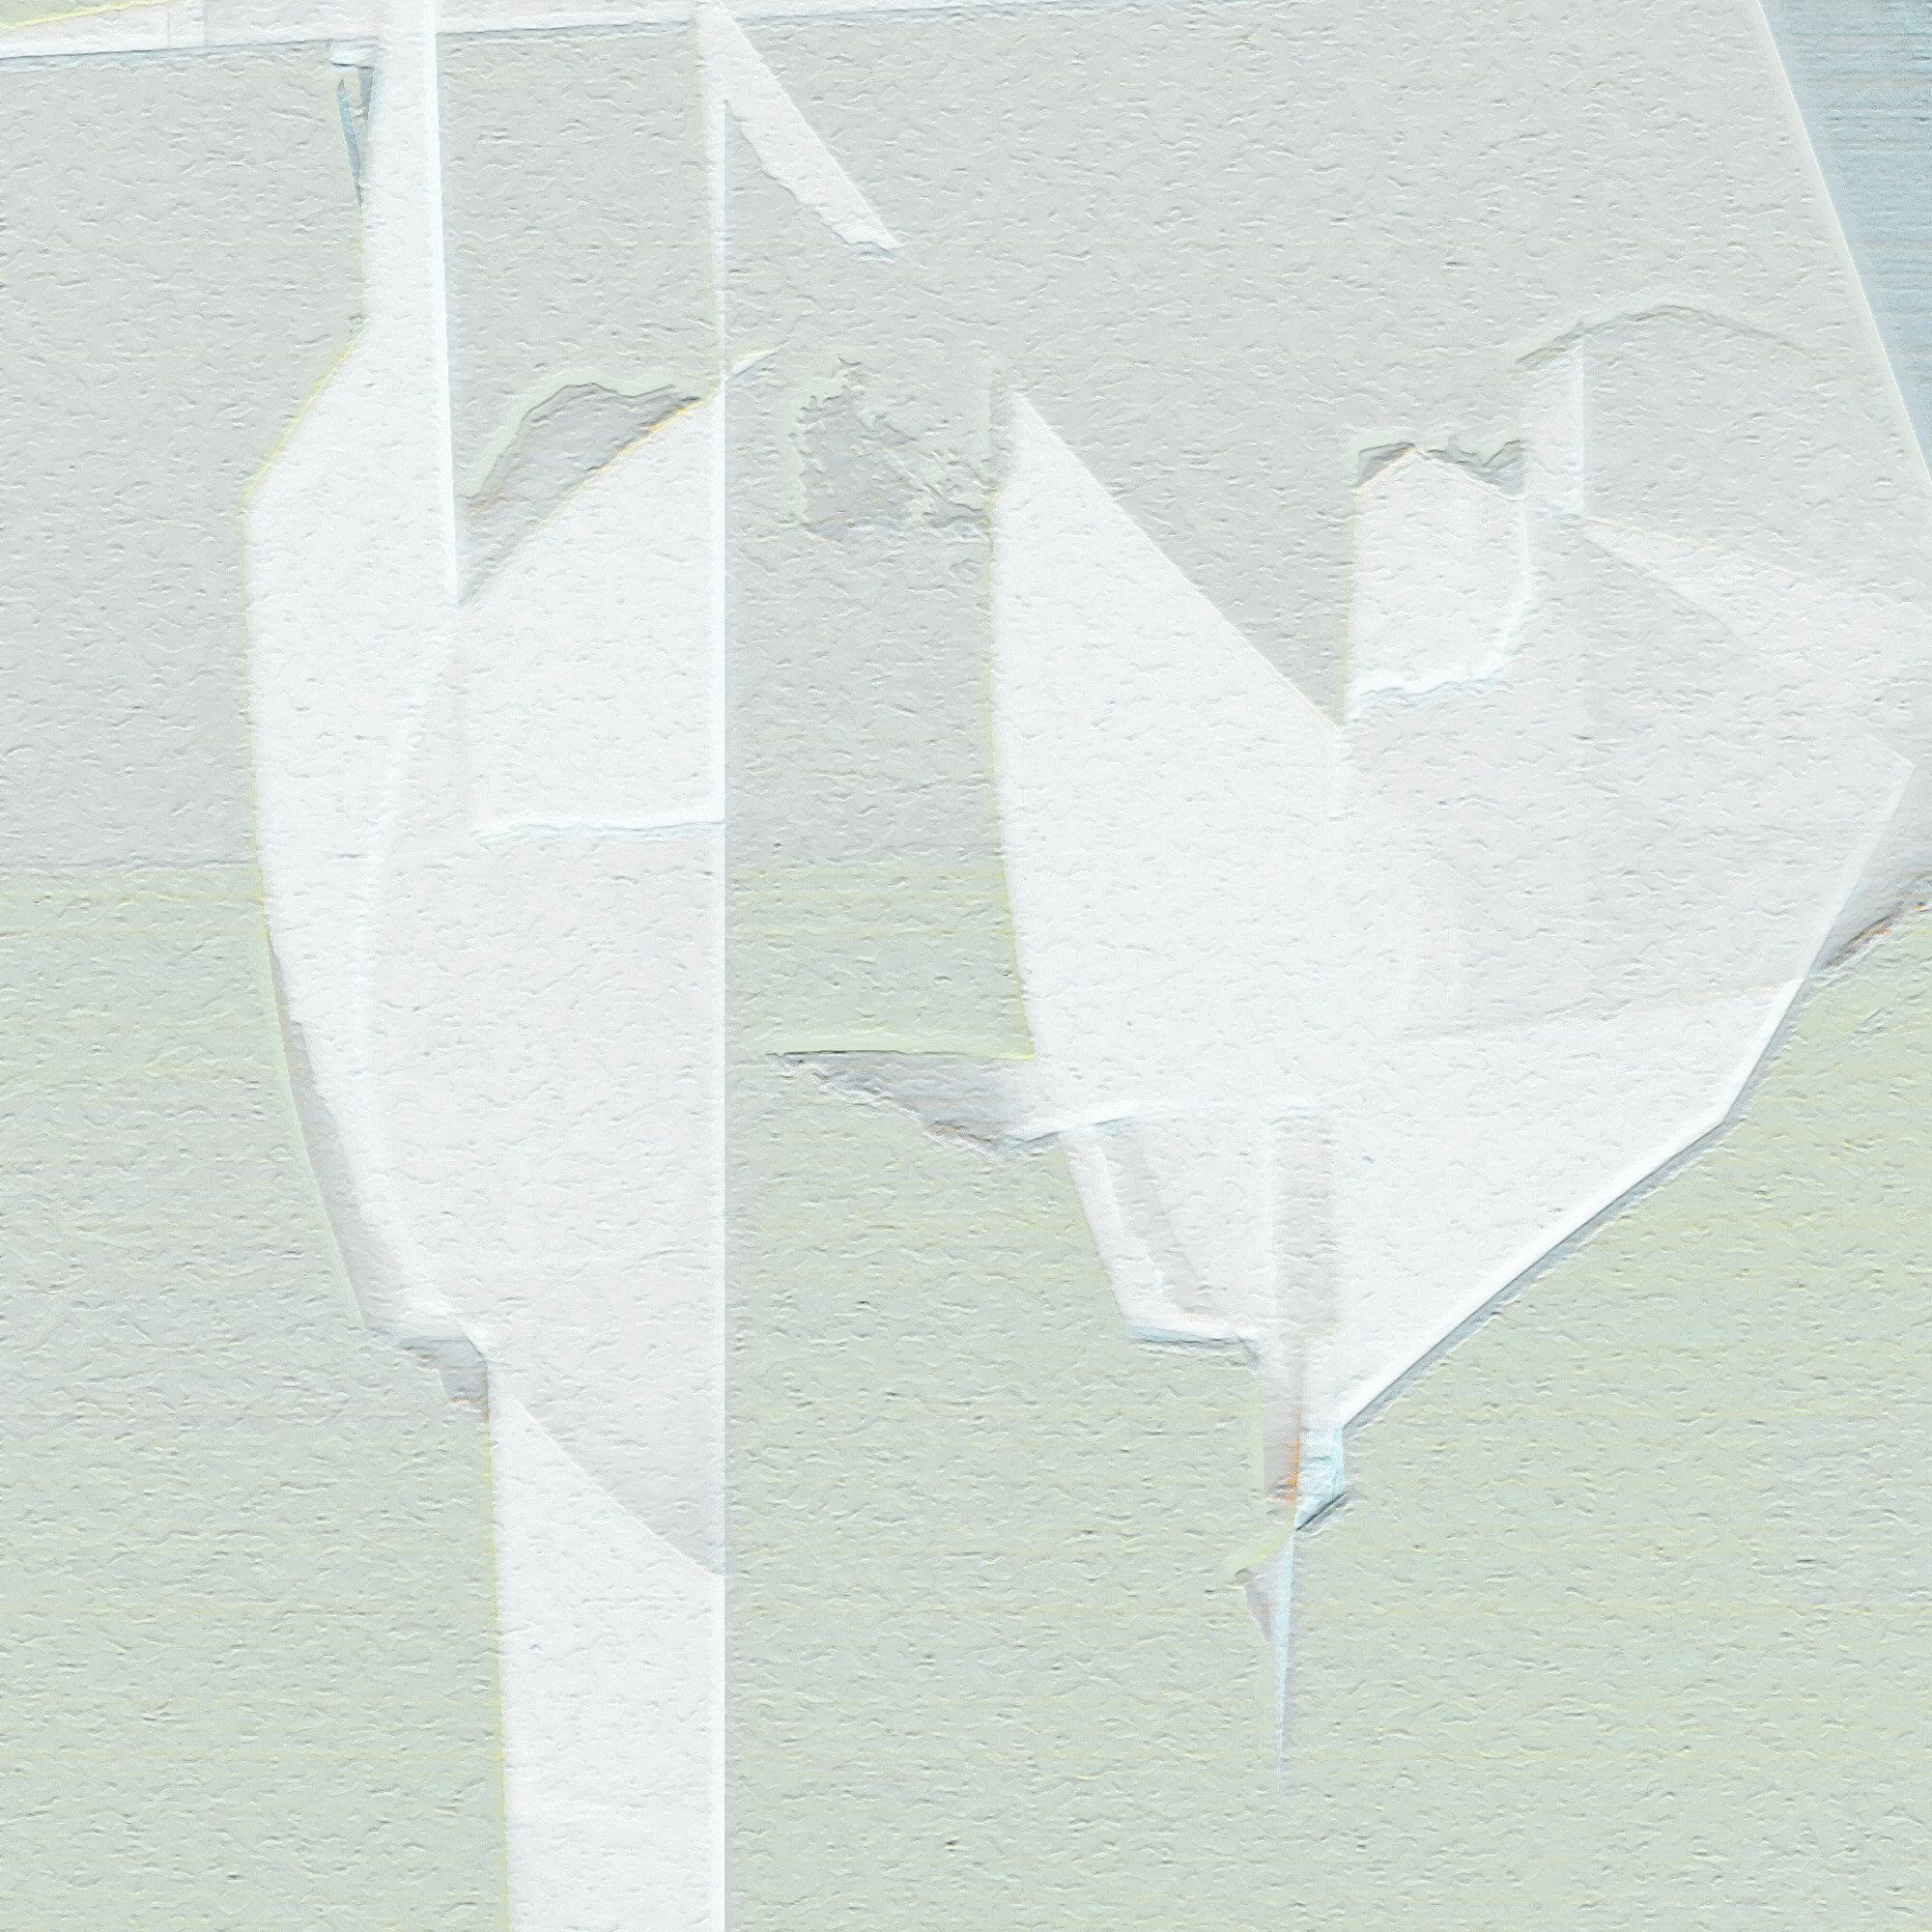 190721_Stylus_detail2.jpg